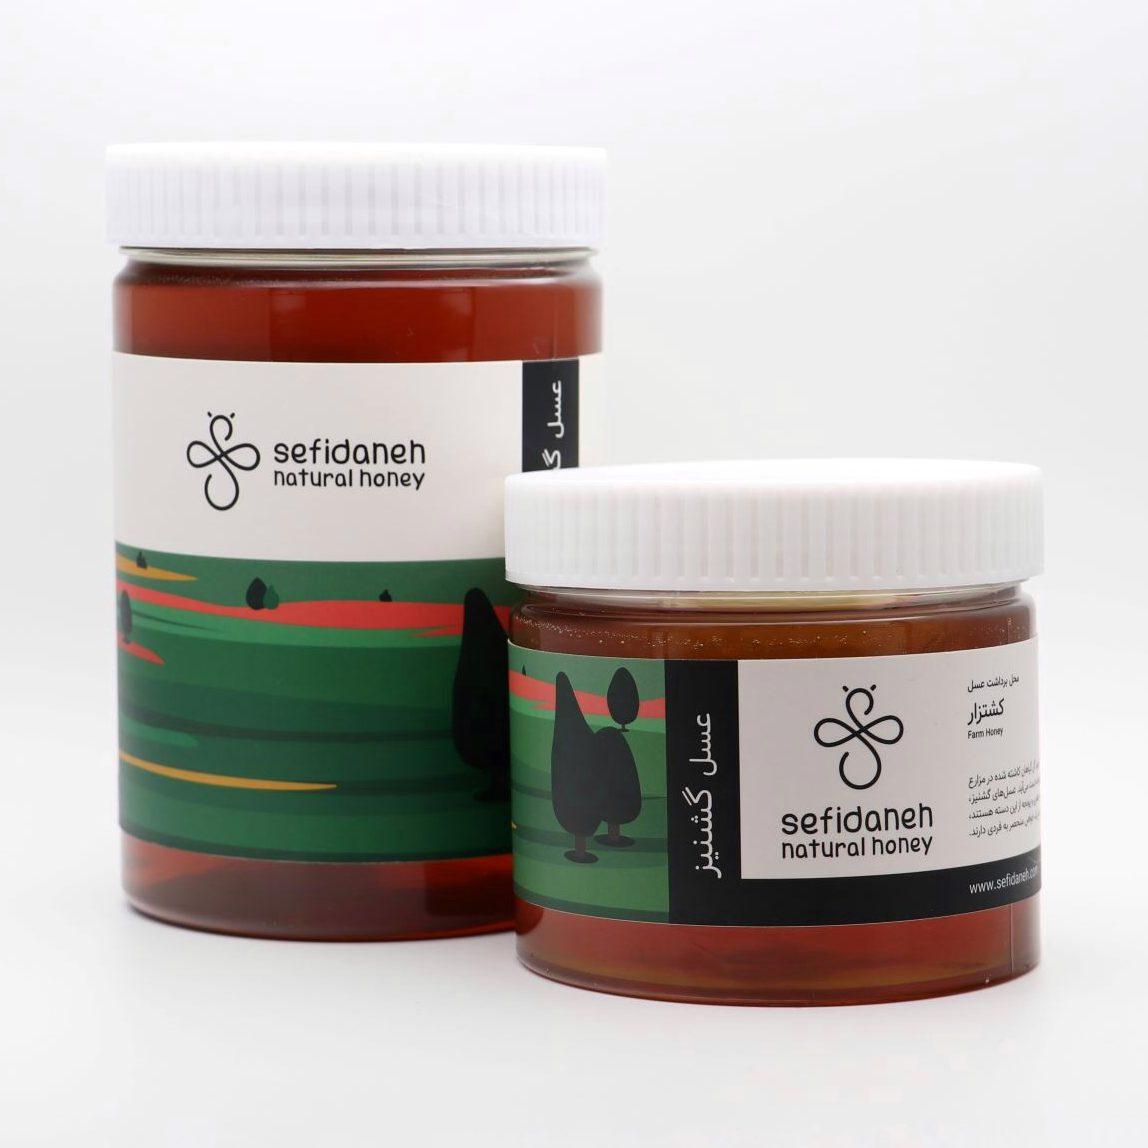 خرید عسل گشنیز - قیمت عسل گشنیز - خواص عسل گشنیز - سفیدانه